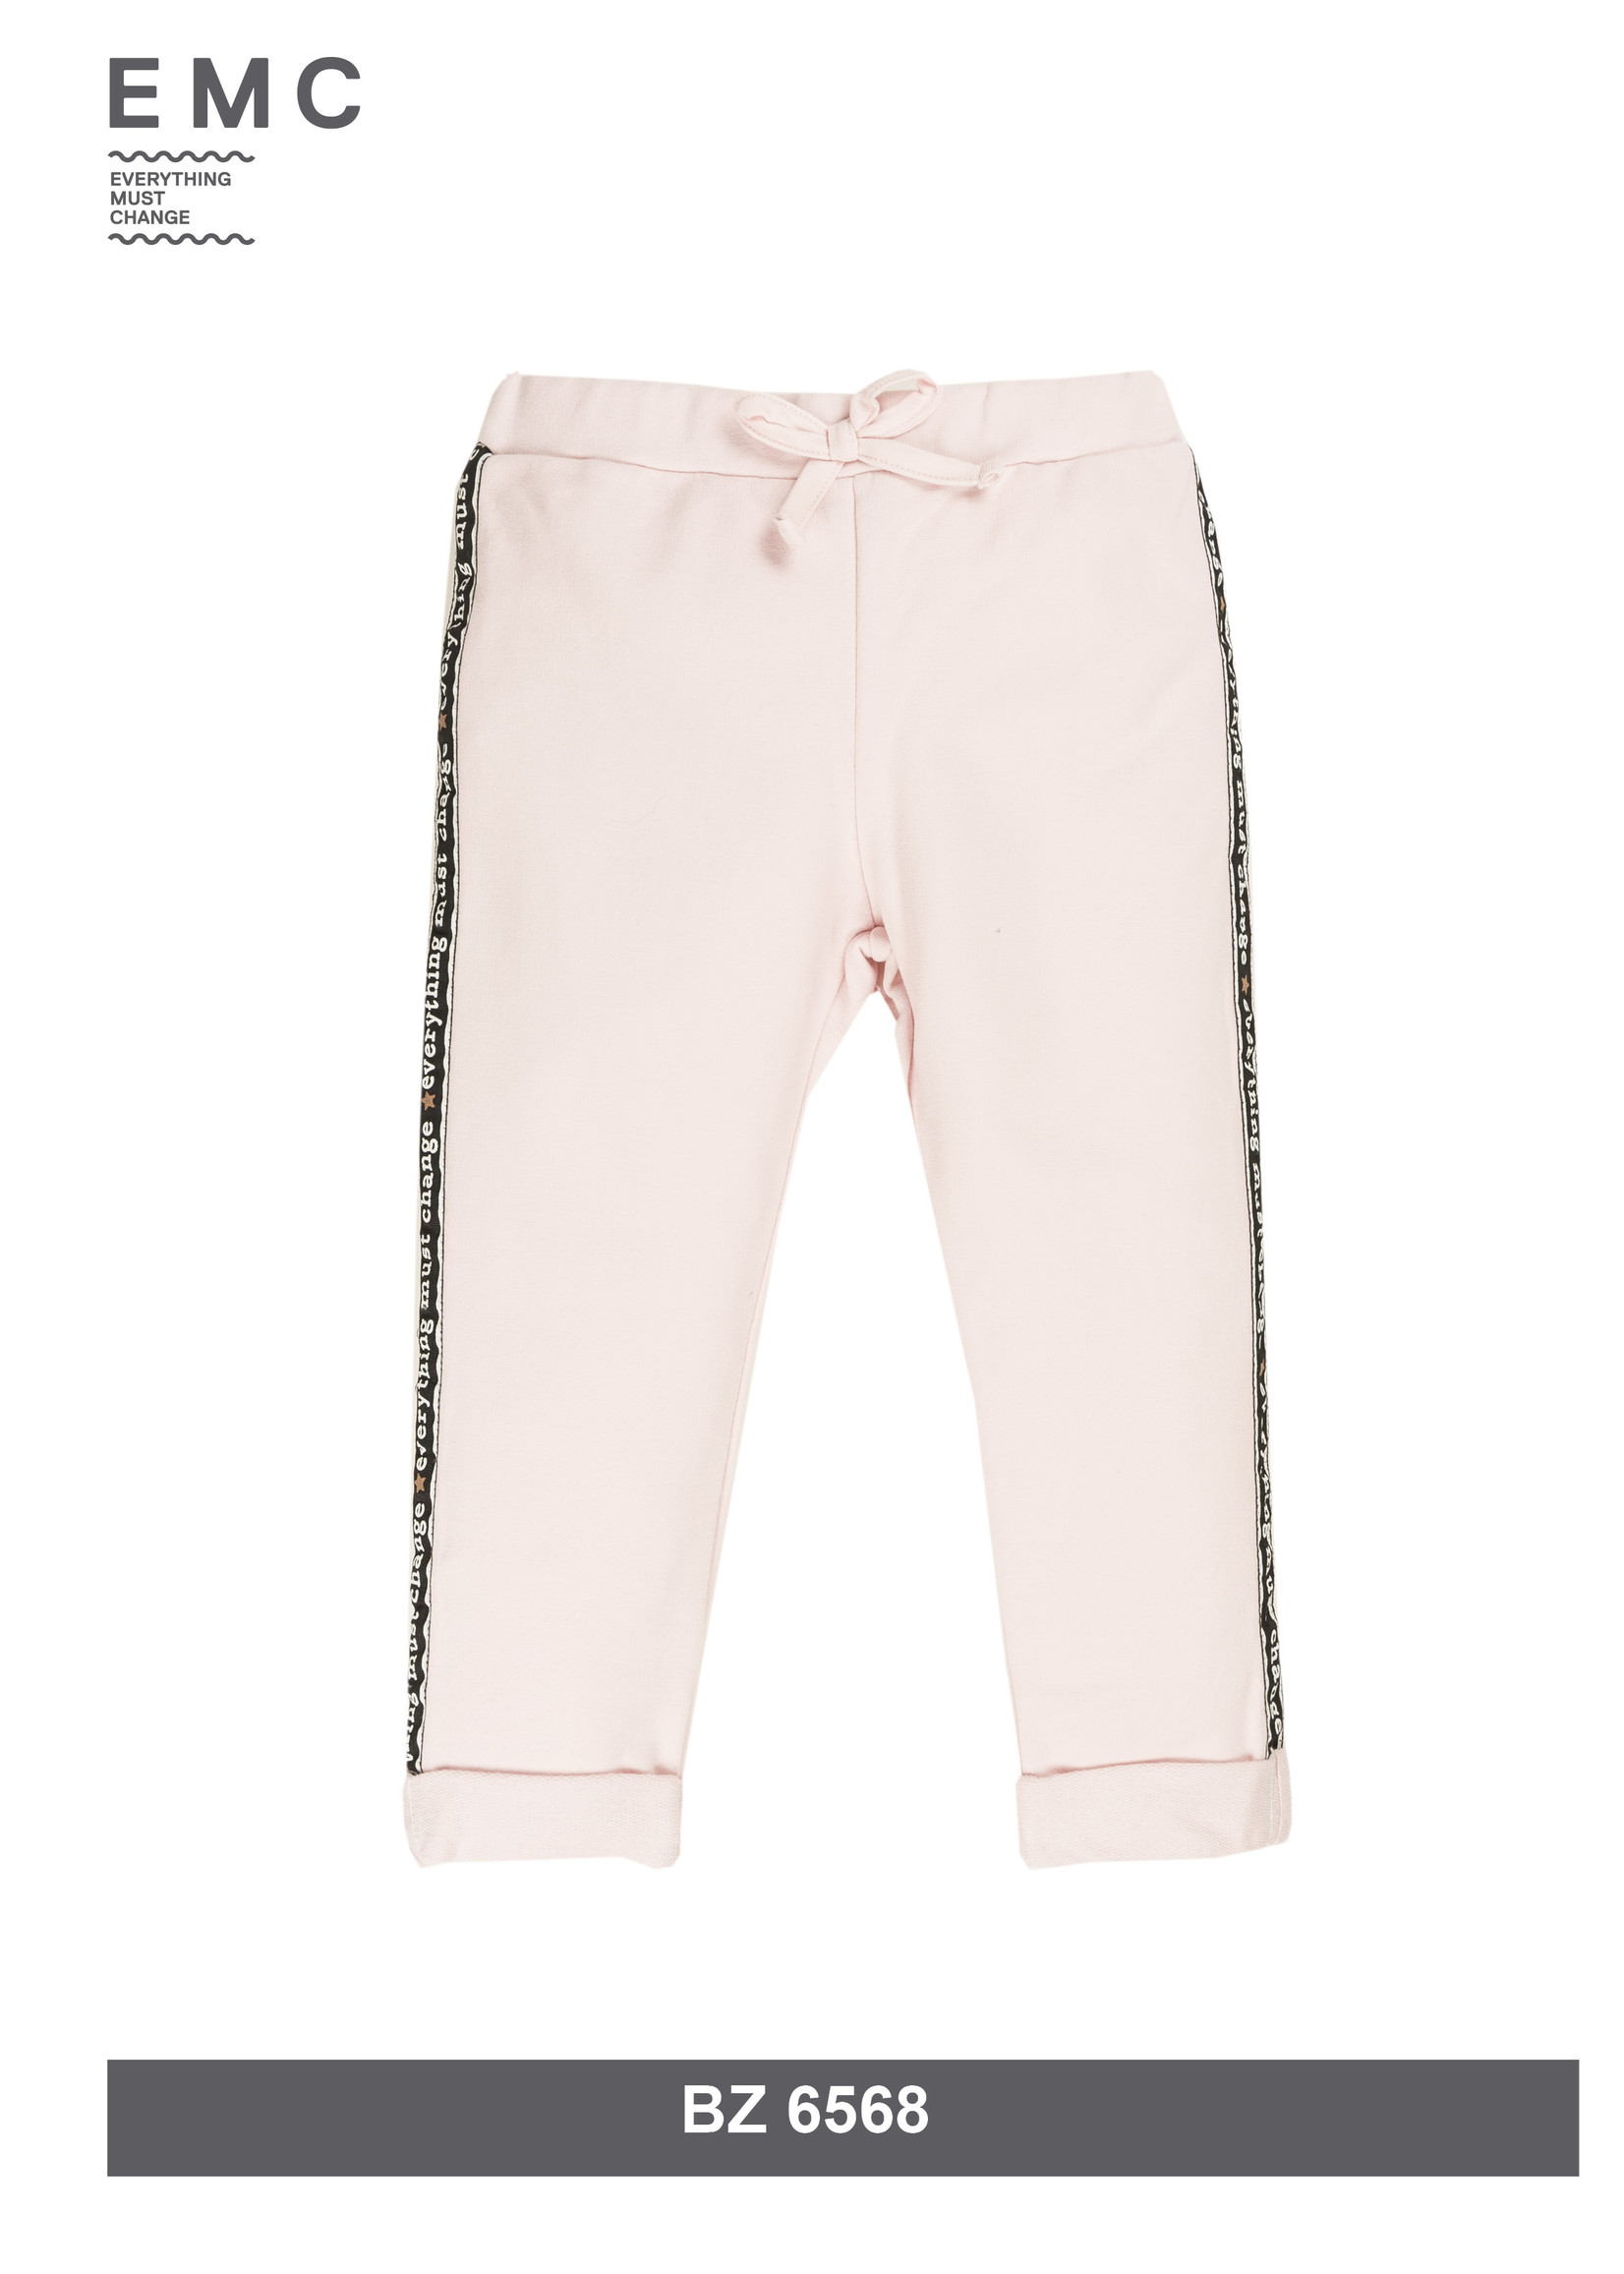 EMC EMC pink sweatpants